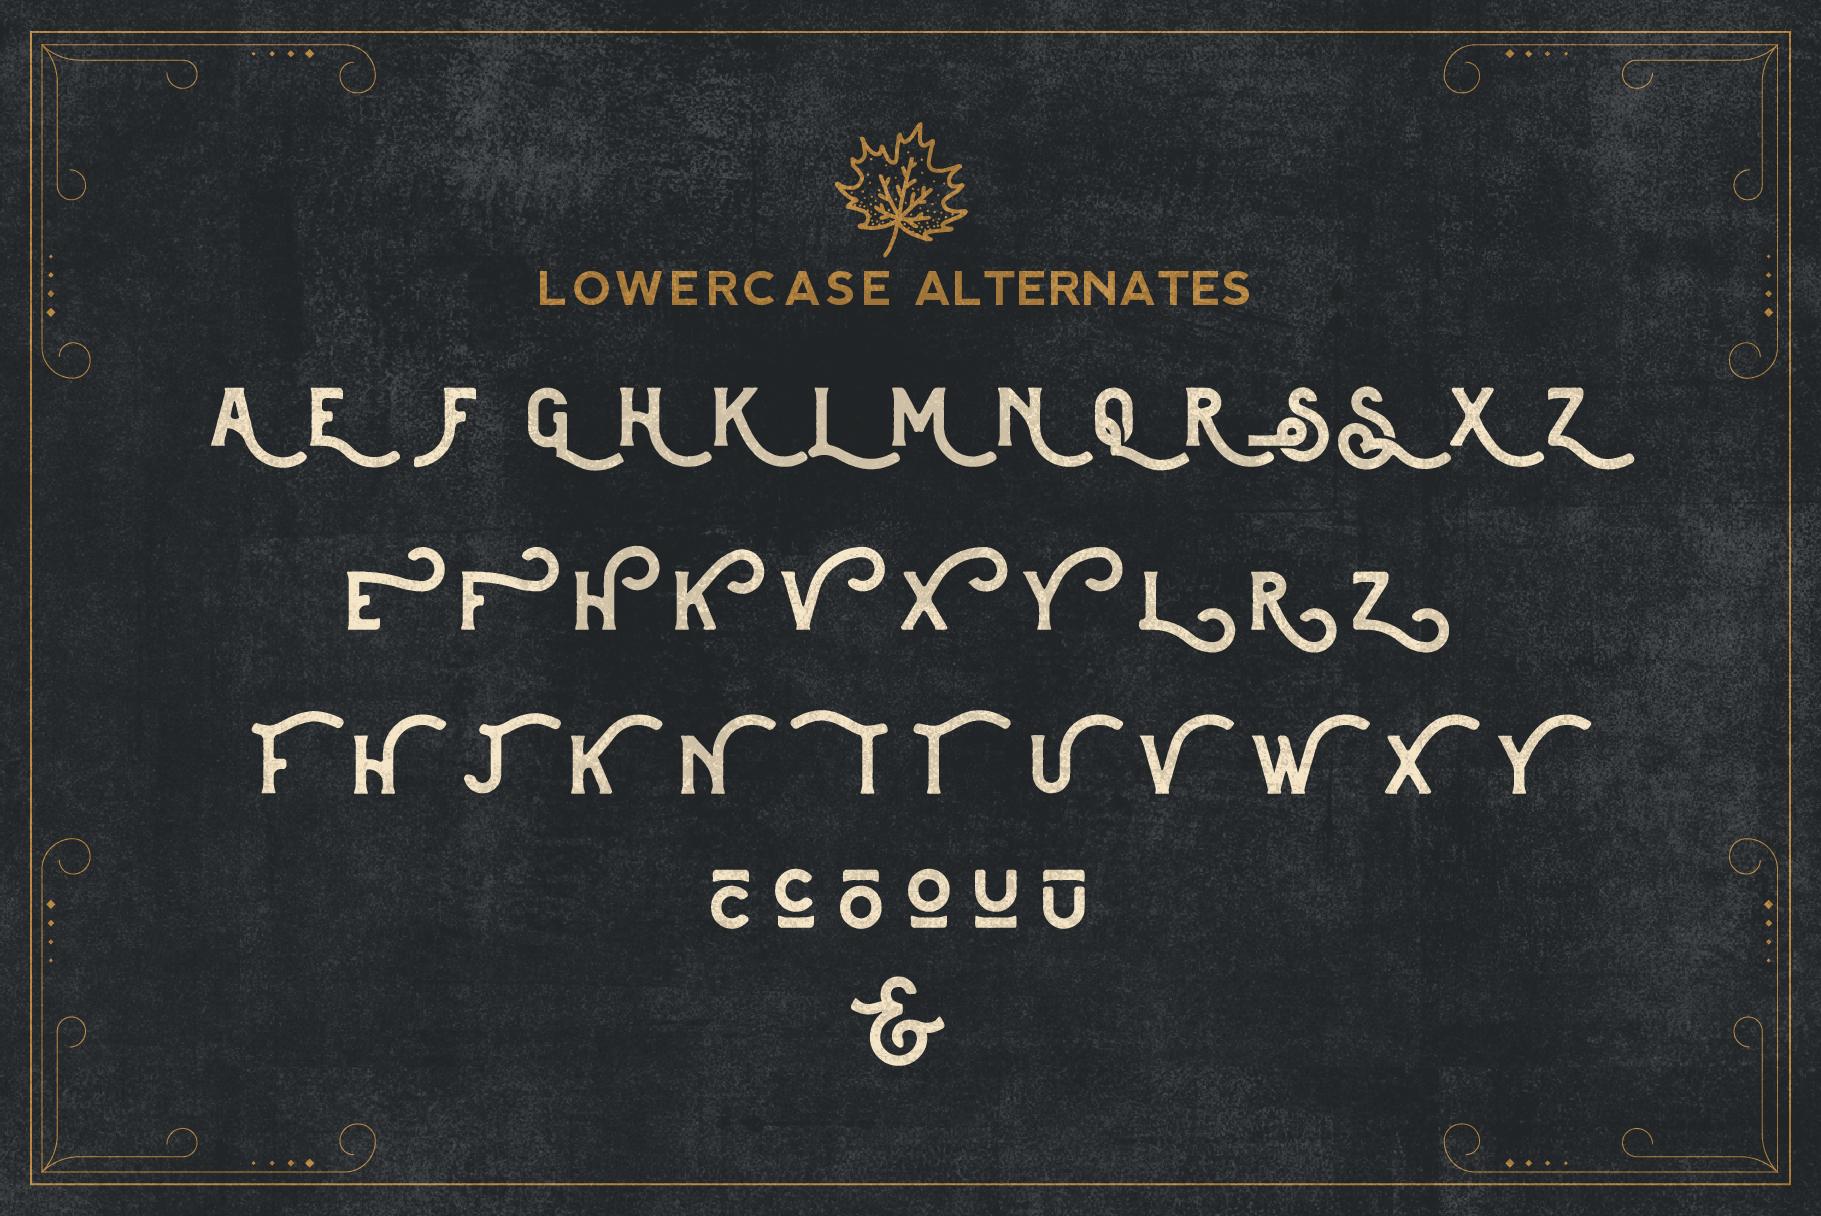 Brewski - Brewery Typeface example image 10